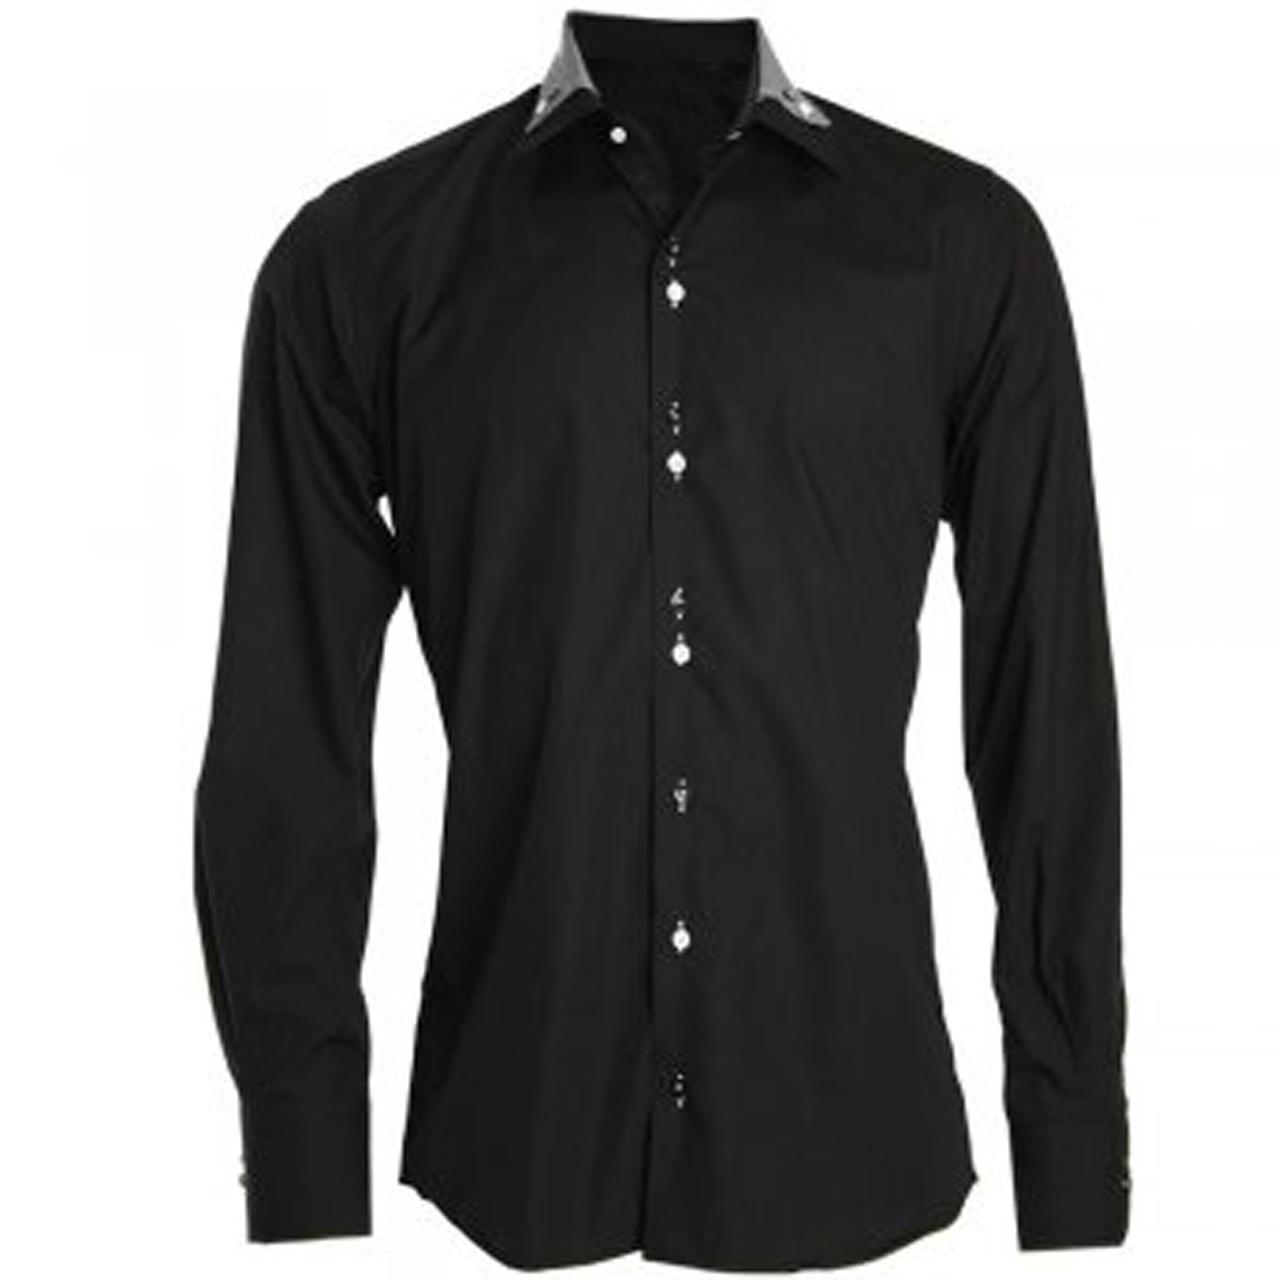 Men 39 s designer double collar black shirt for Small collar dress shirt